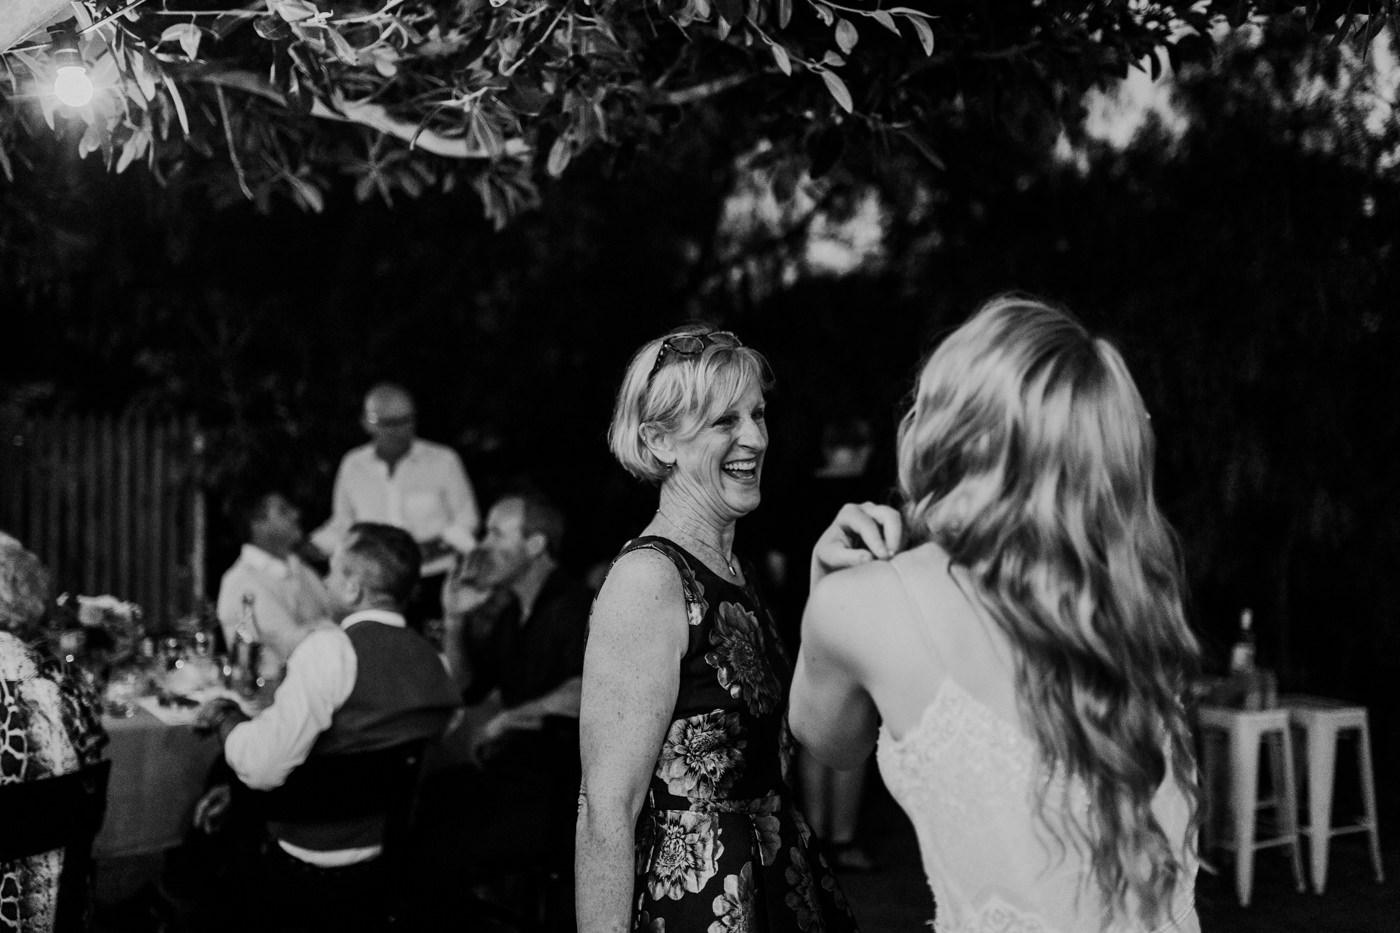 Anthony & Eliet - Wagga Wagga Wedding - Country NSW - Samantha Heather Photography-174.jpg